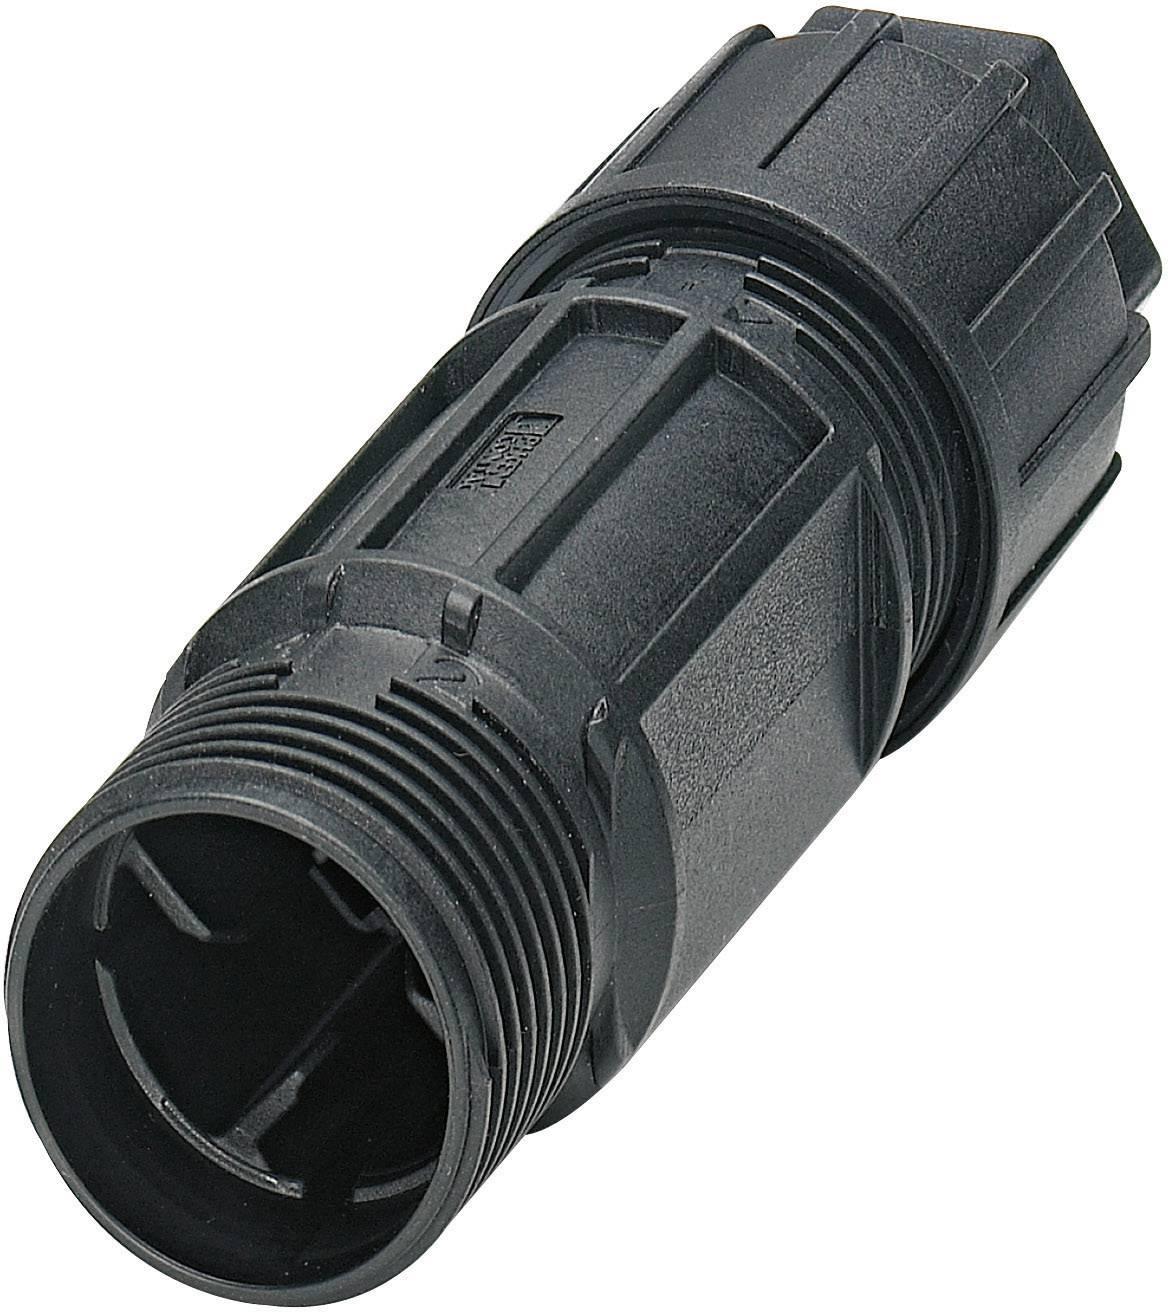 QUICKCON konektor Phoenix QPD C 3PE2,5 1X6-10 BK (1582220), 3 + PE , IP68